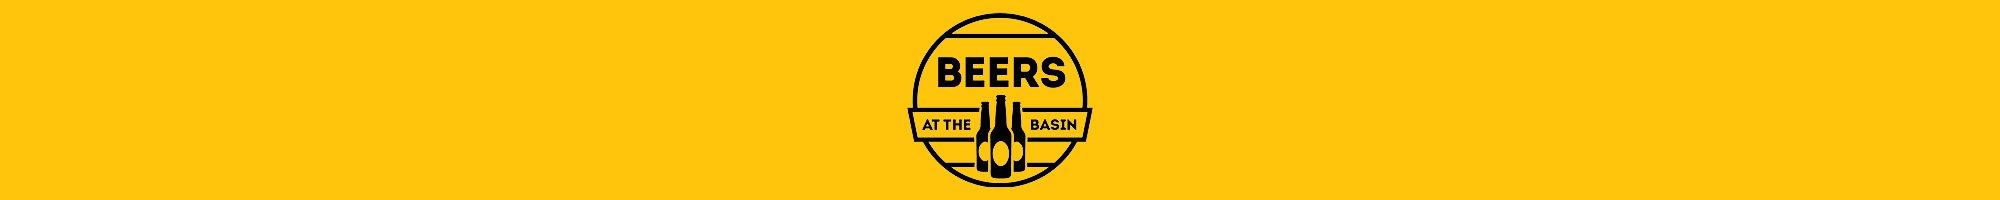 Beers Header